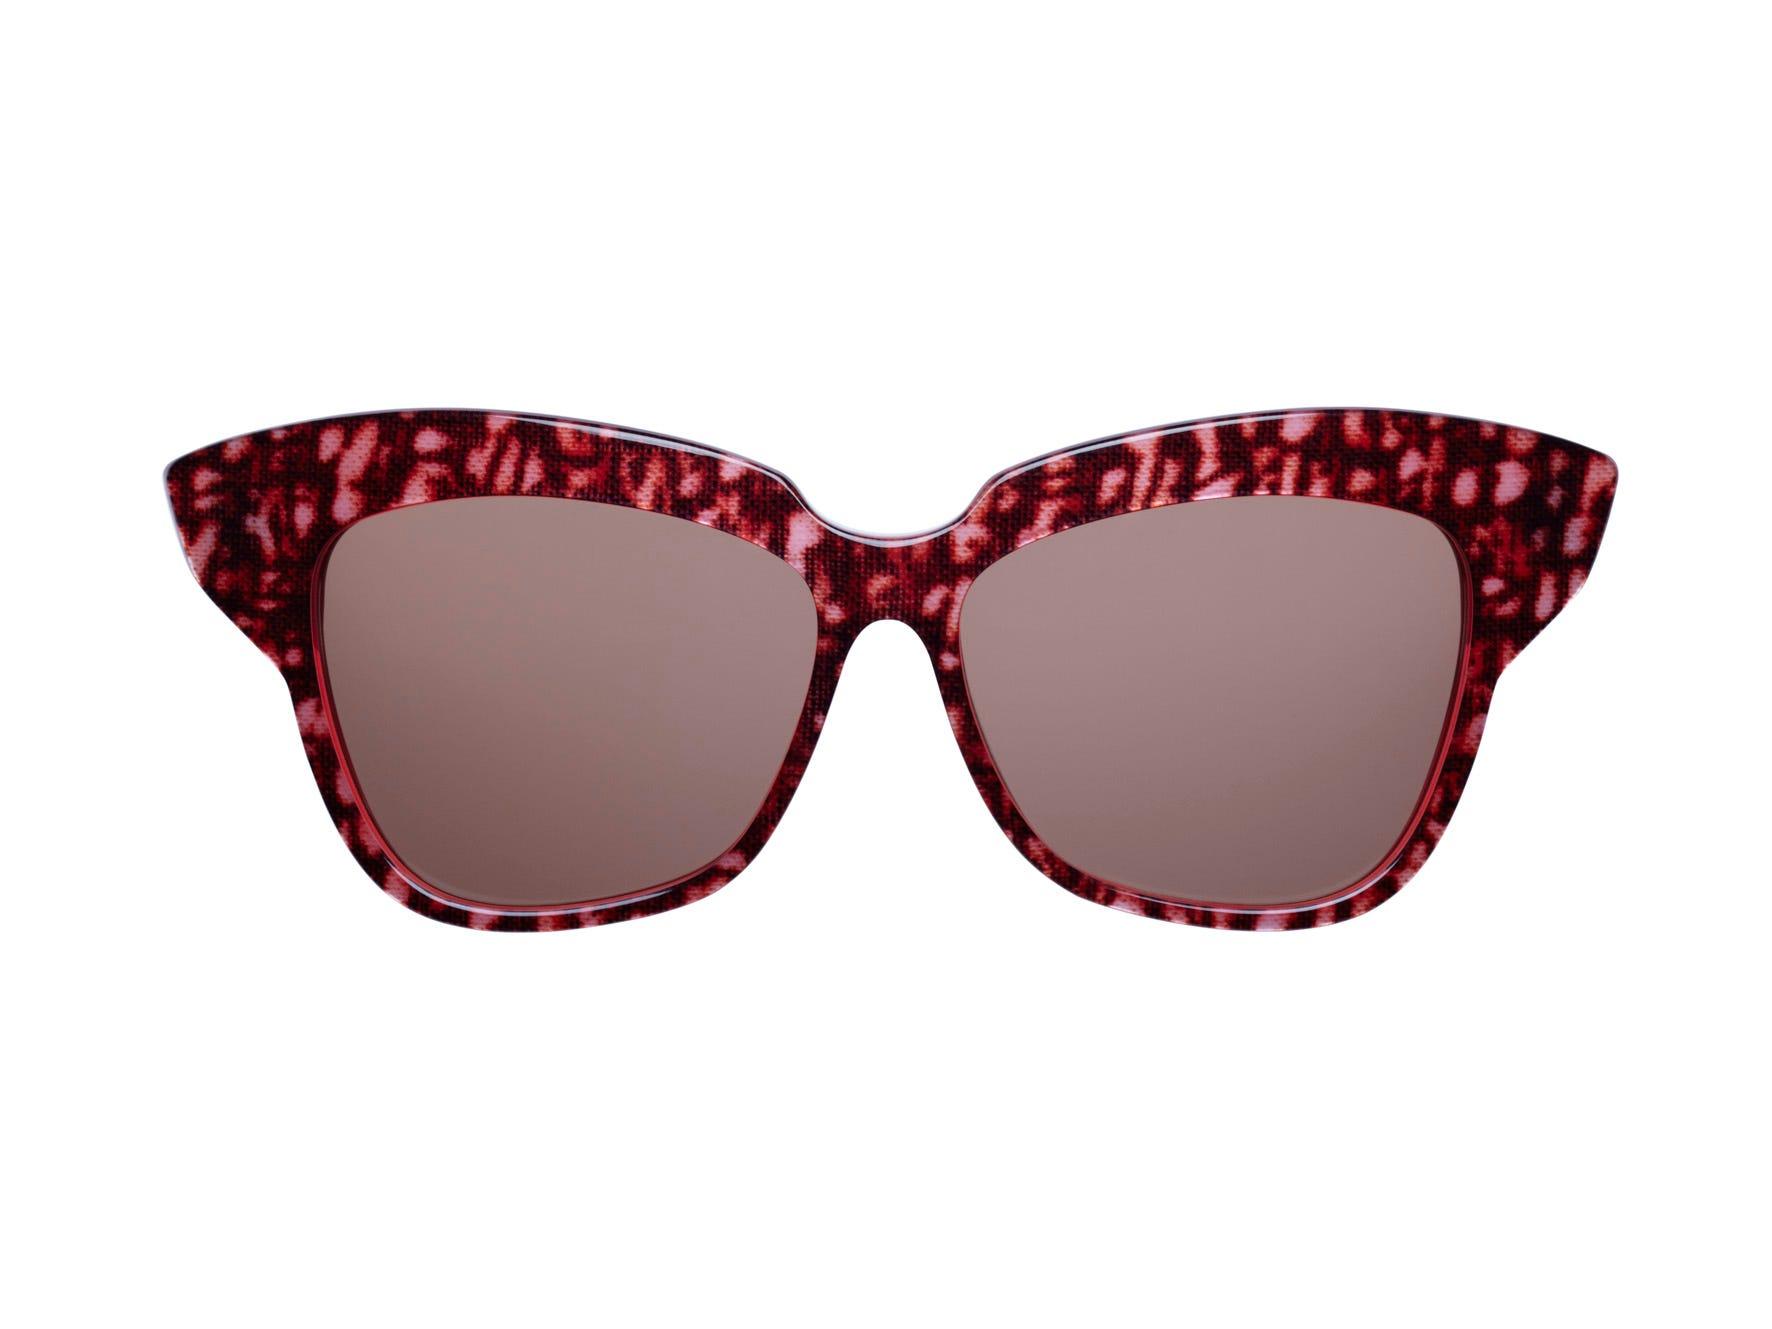 442a115dfafa WUNDERKIND + Suzy Sunglasses